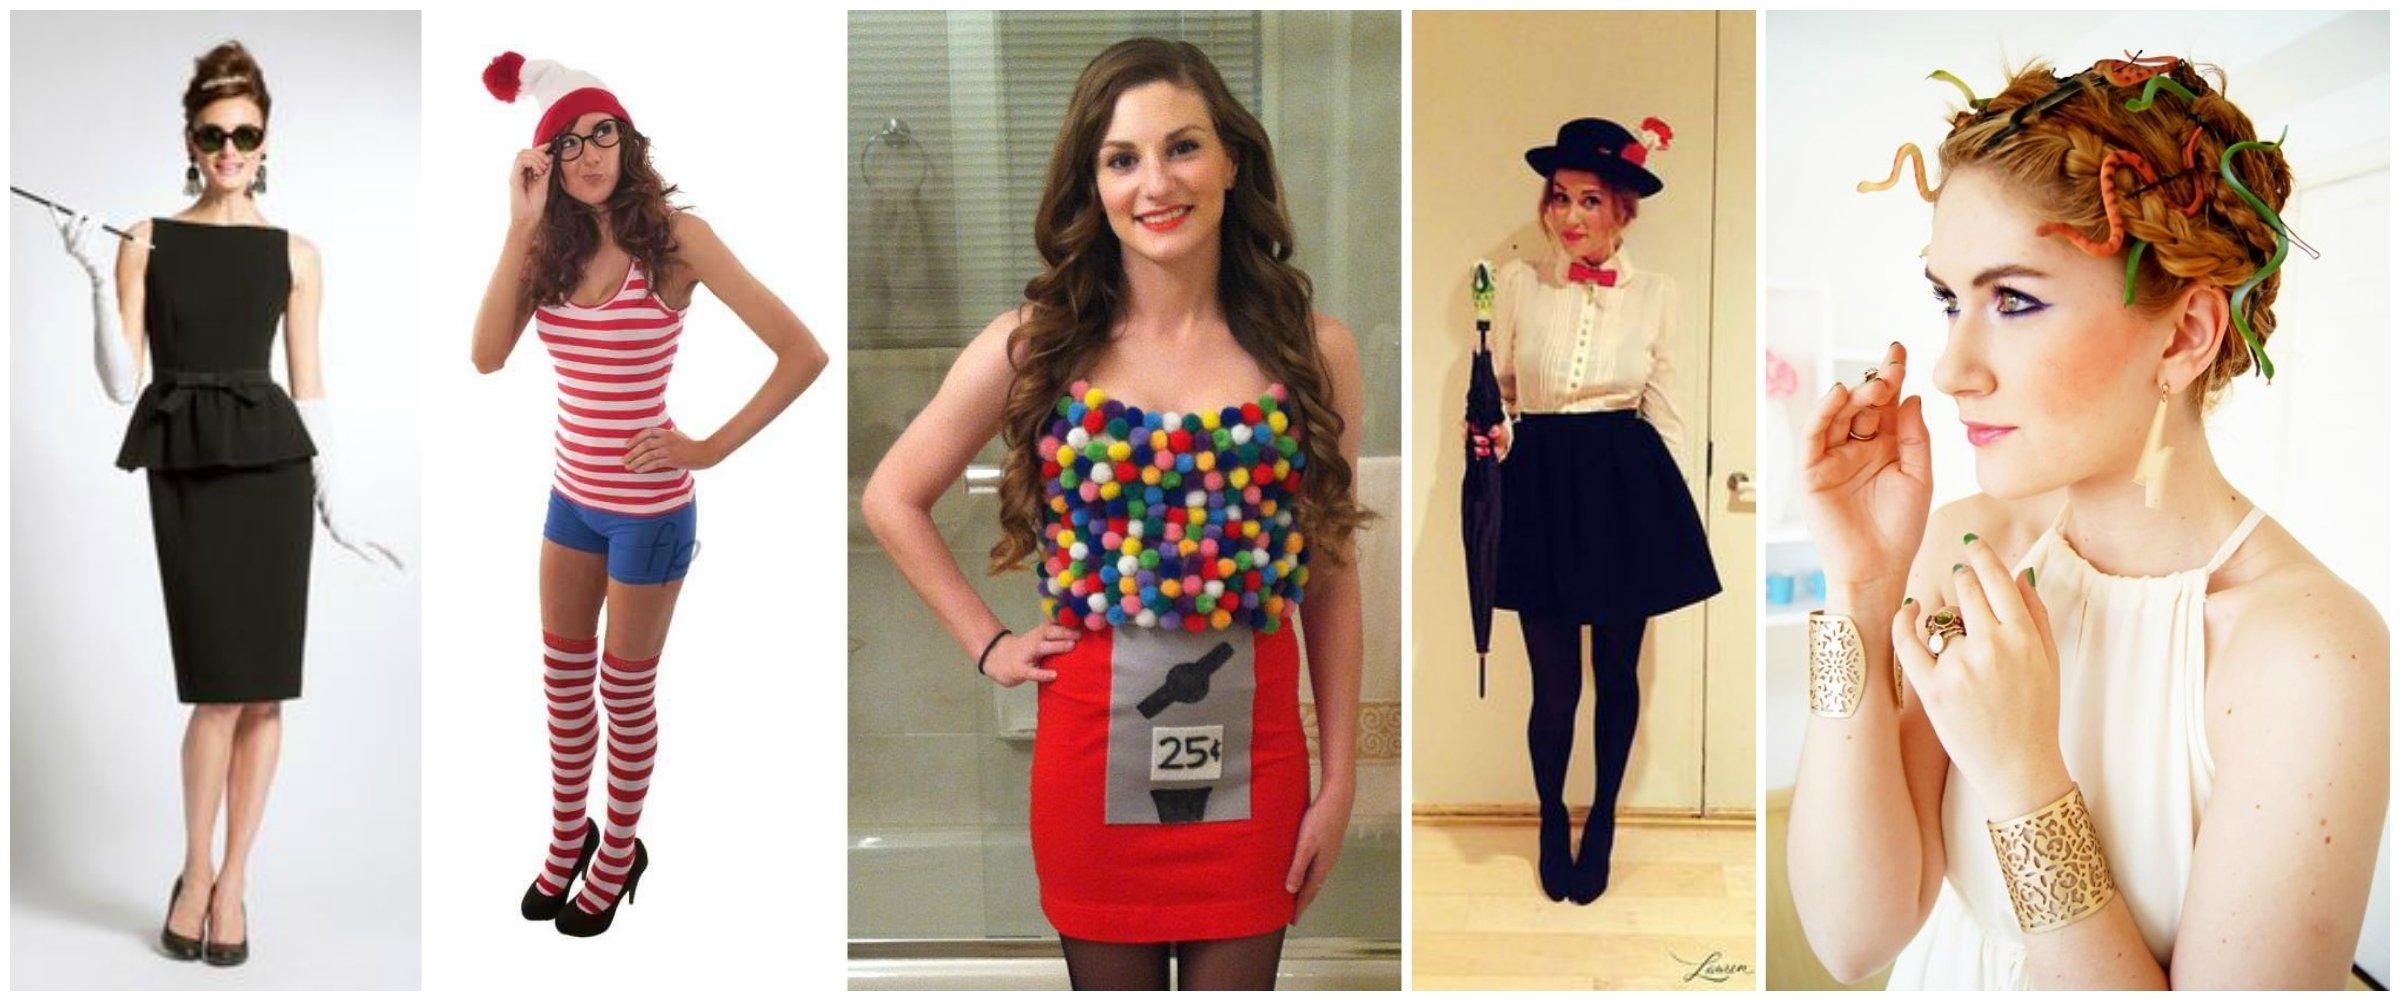 10 Stylish Homemade Halloween Costumes For Women Ideas image gallery homemade halloween costumes girls diy halloween 8 2020